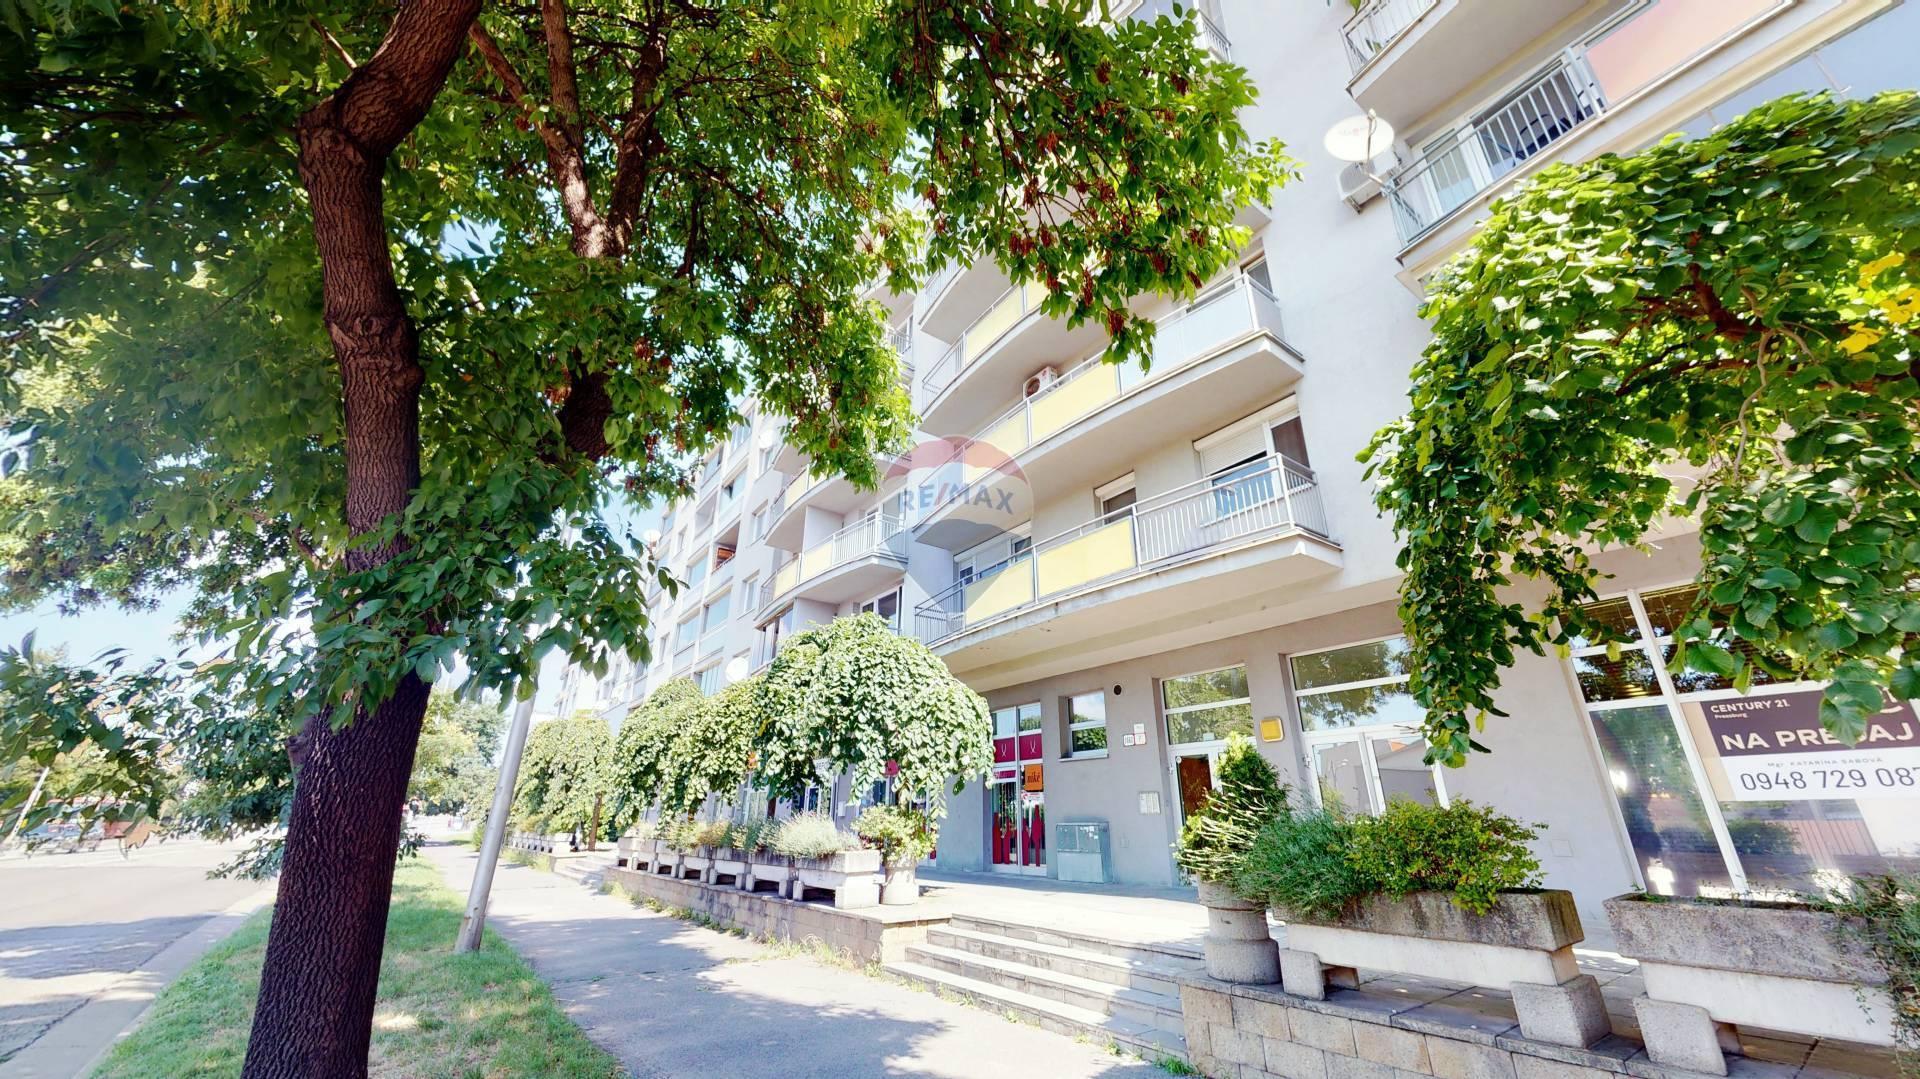 Predaj bytu (4 izbový) 107 m2, Bratislava - Petržalka -